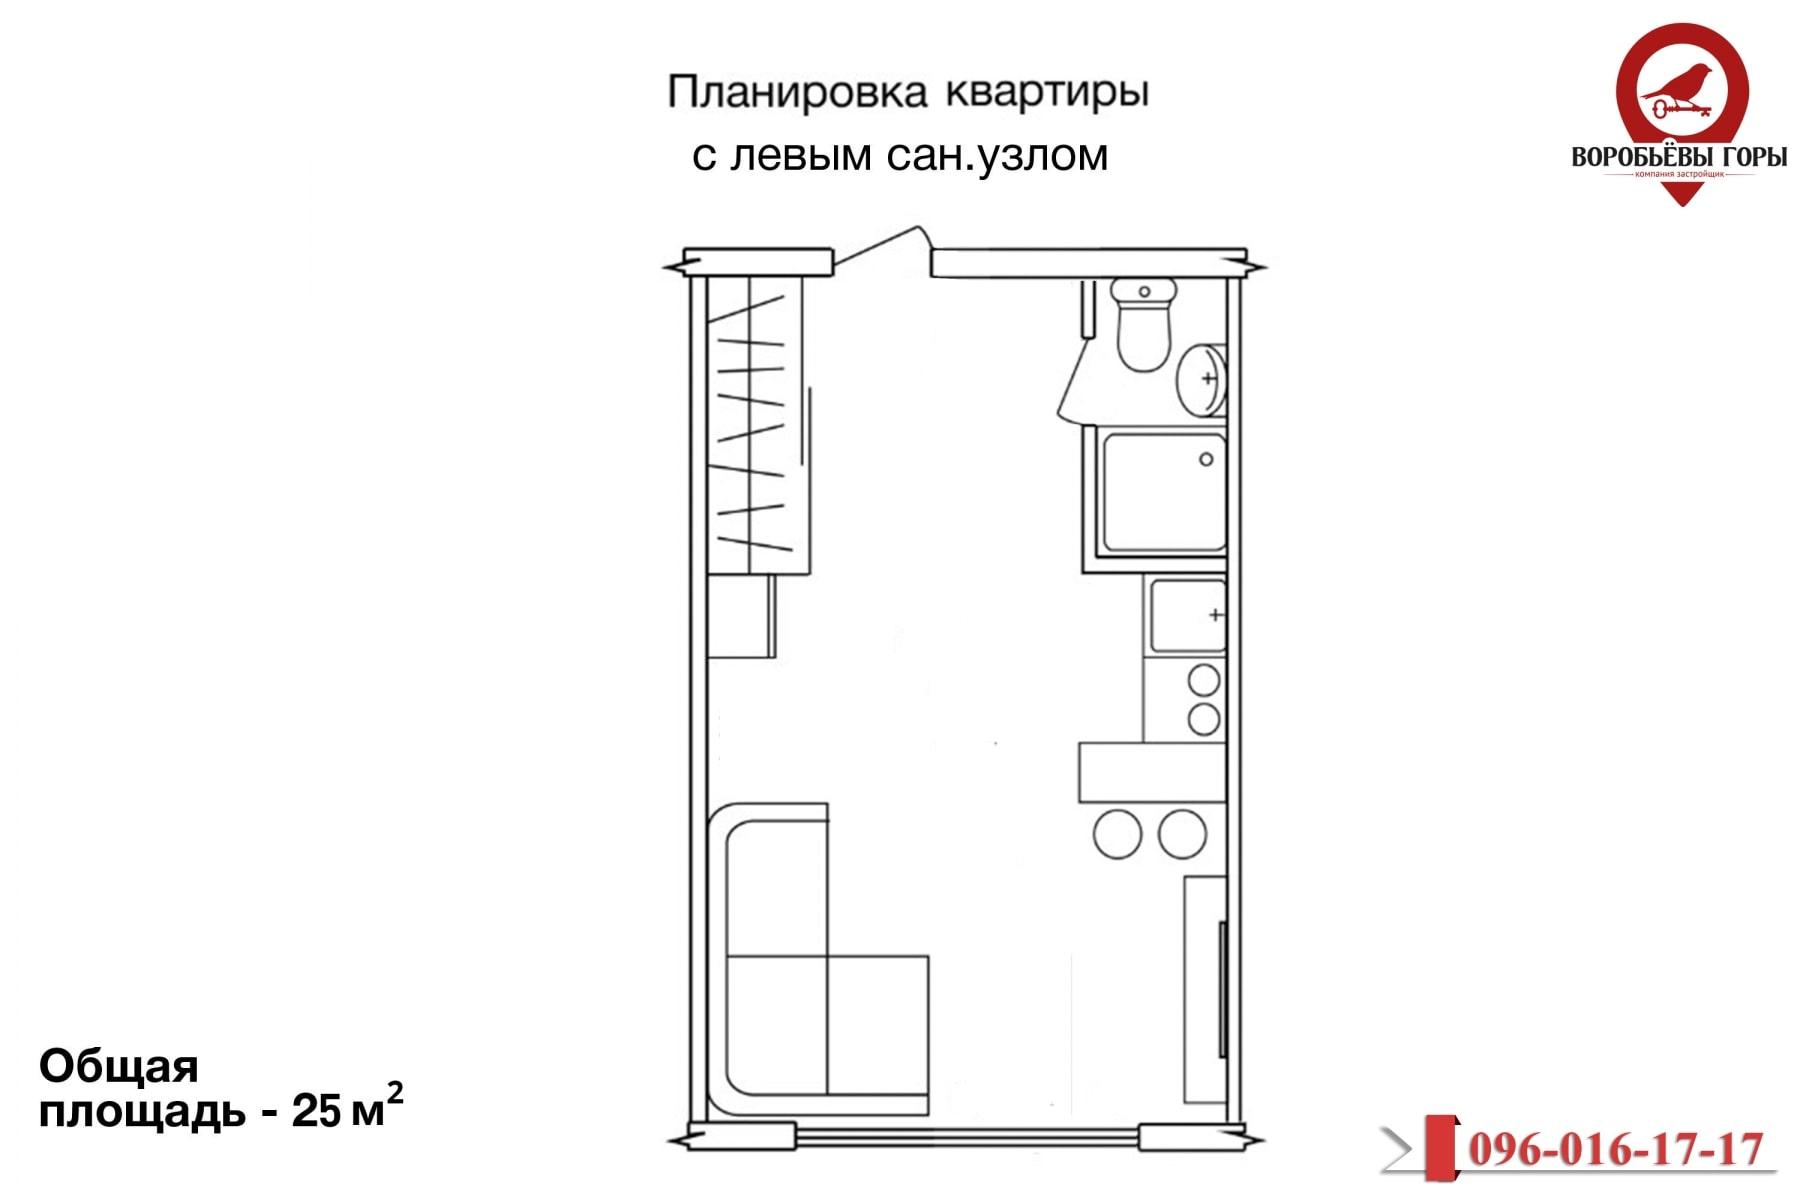 однокомнатная квартира 25м2